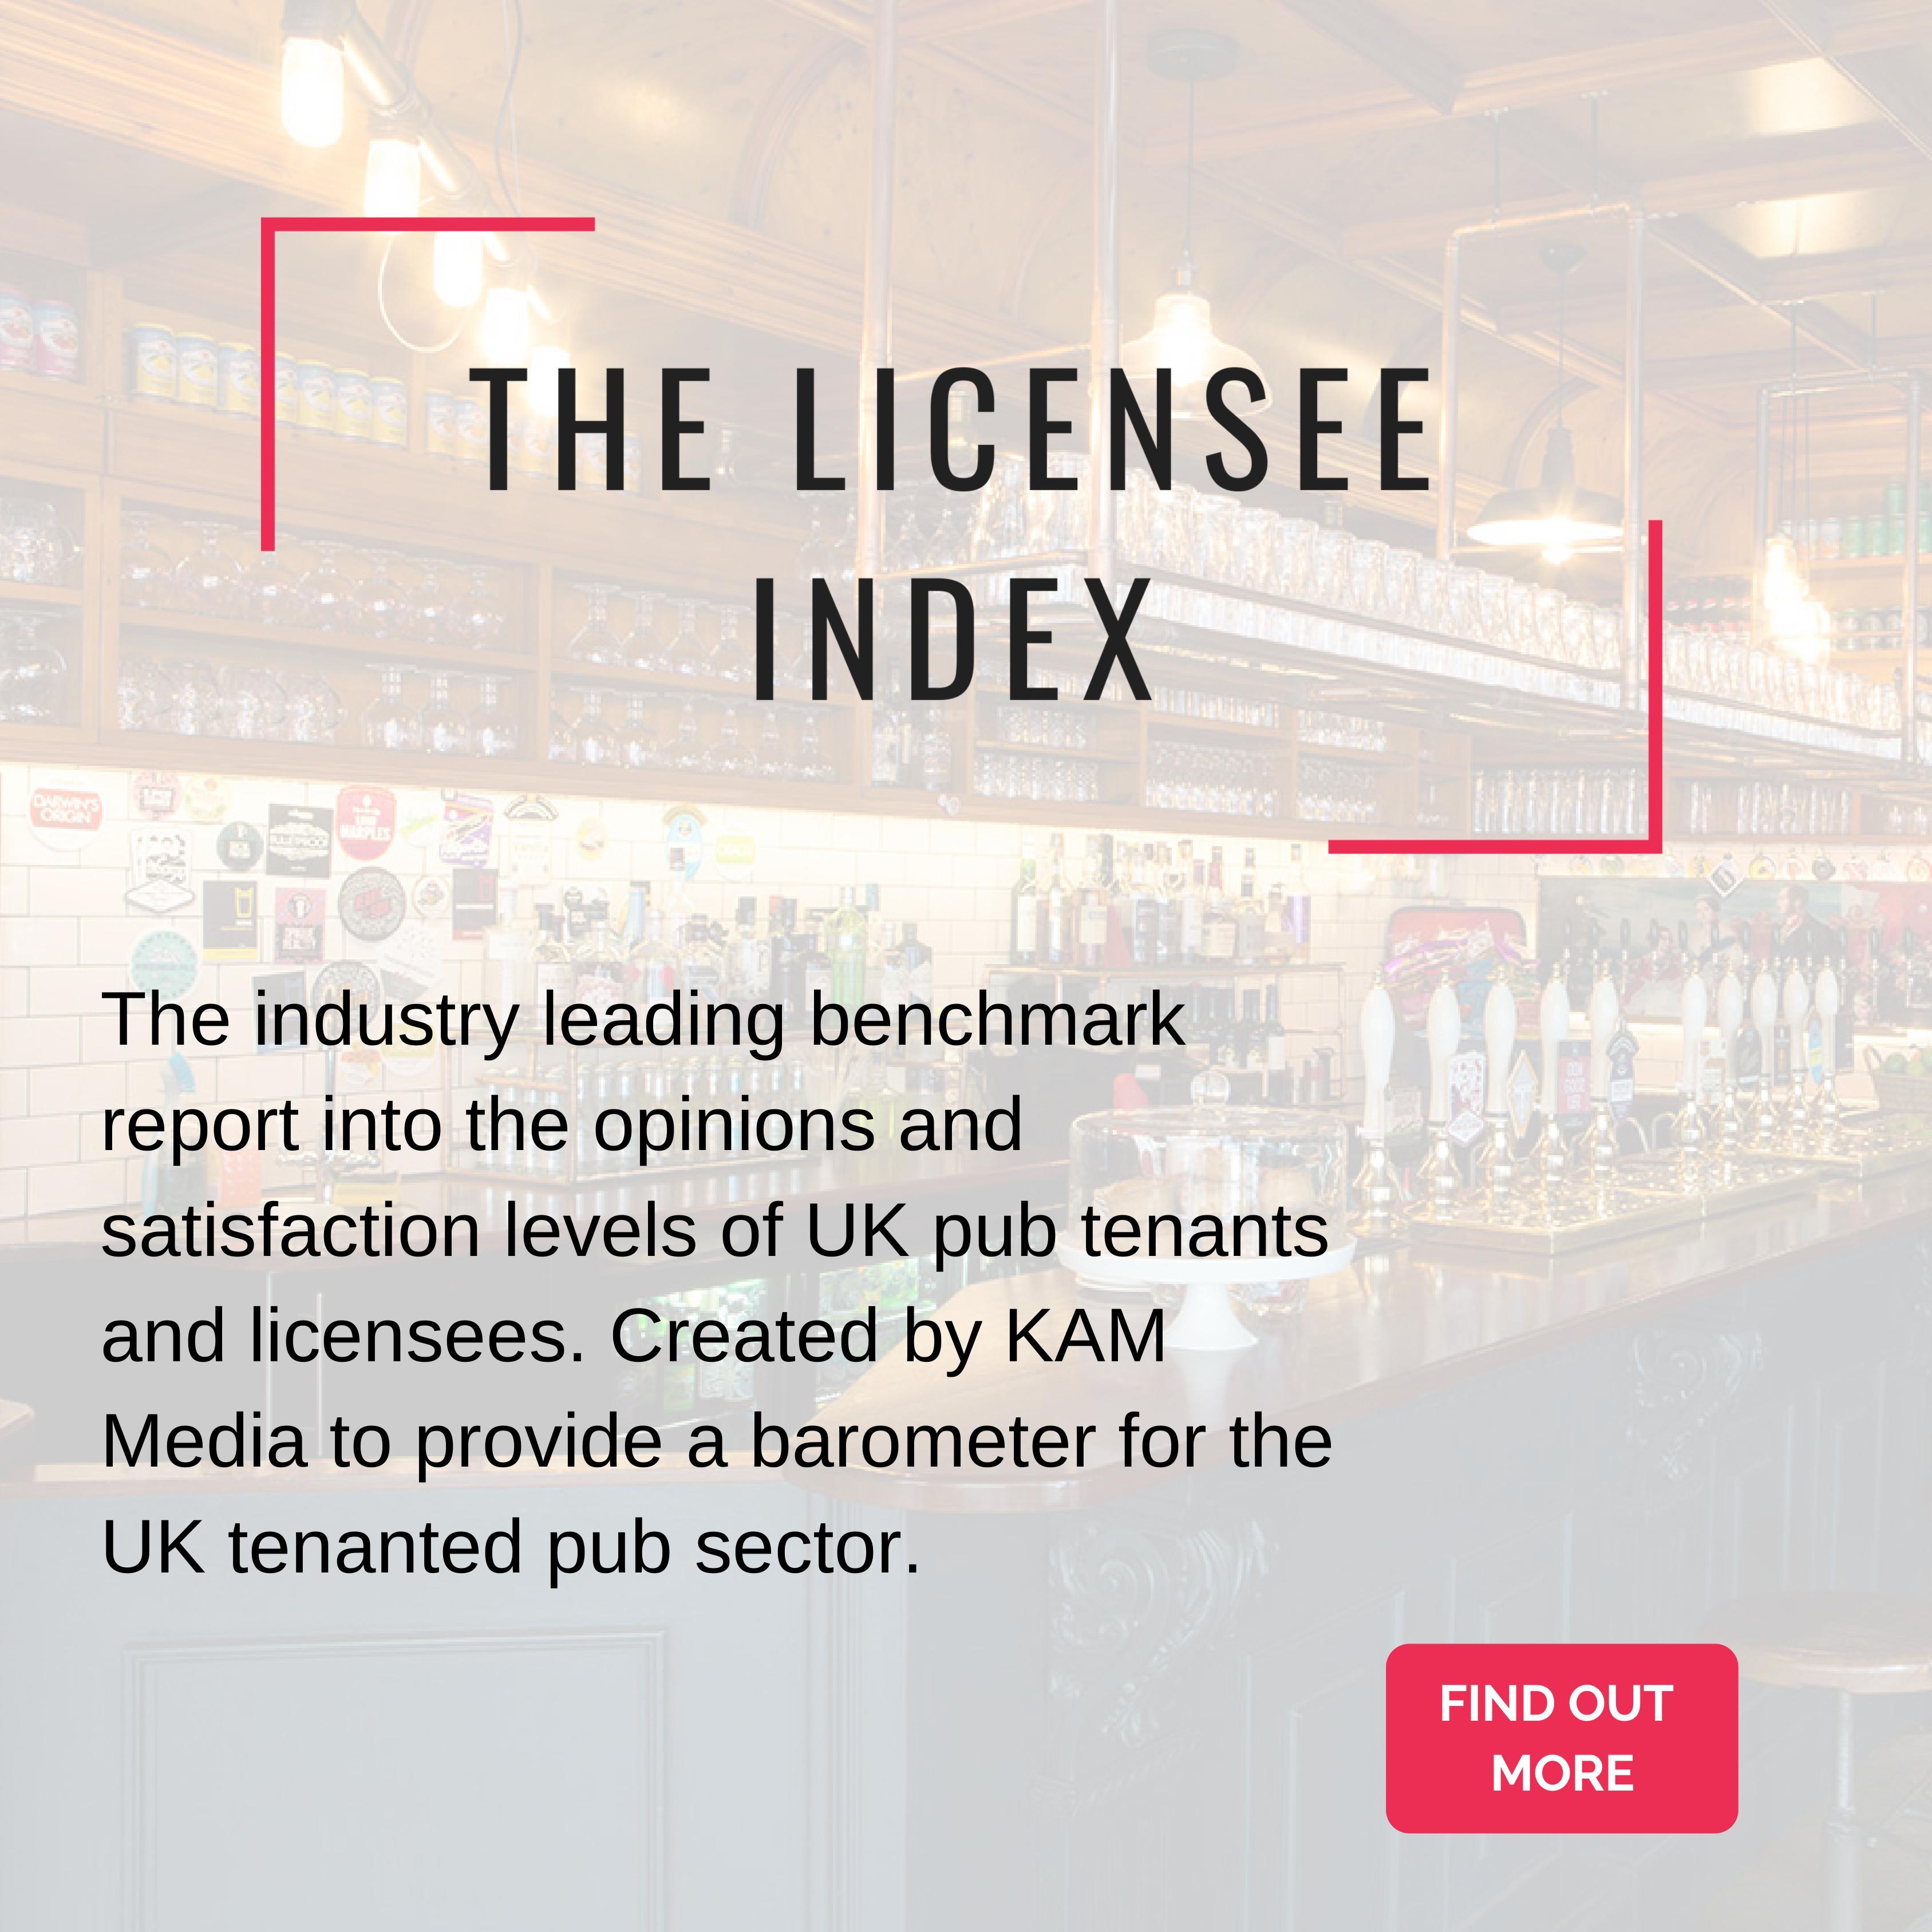 The Licensee Index KAM Media